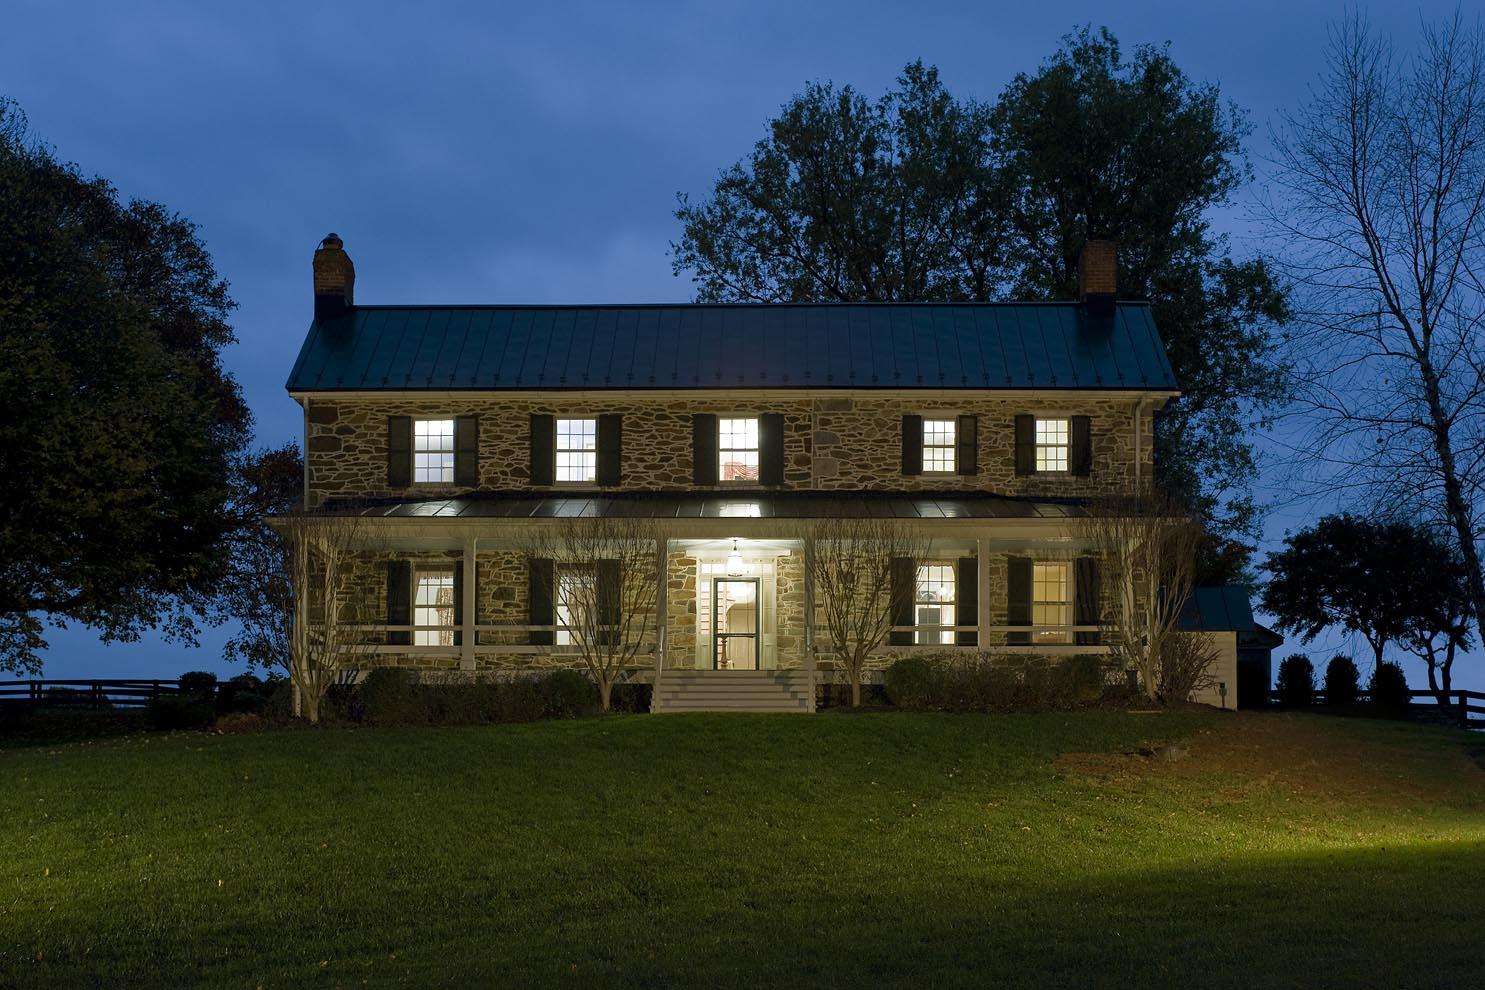 renovated stone manor house at dusk